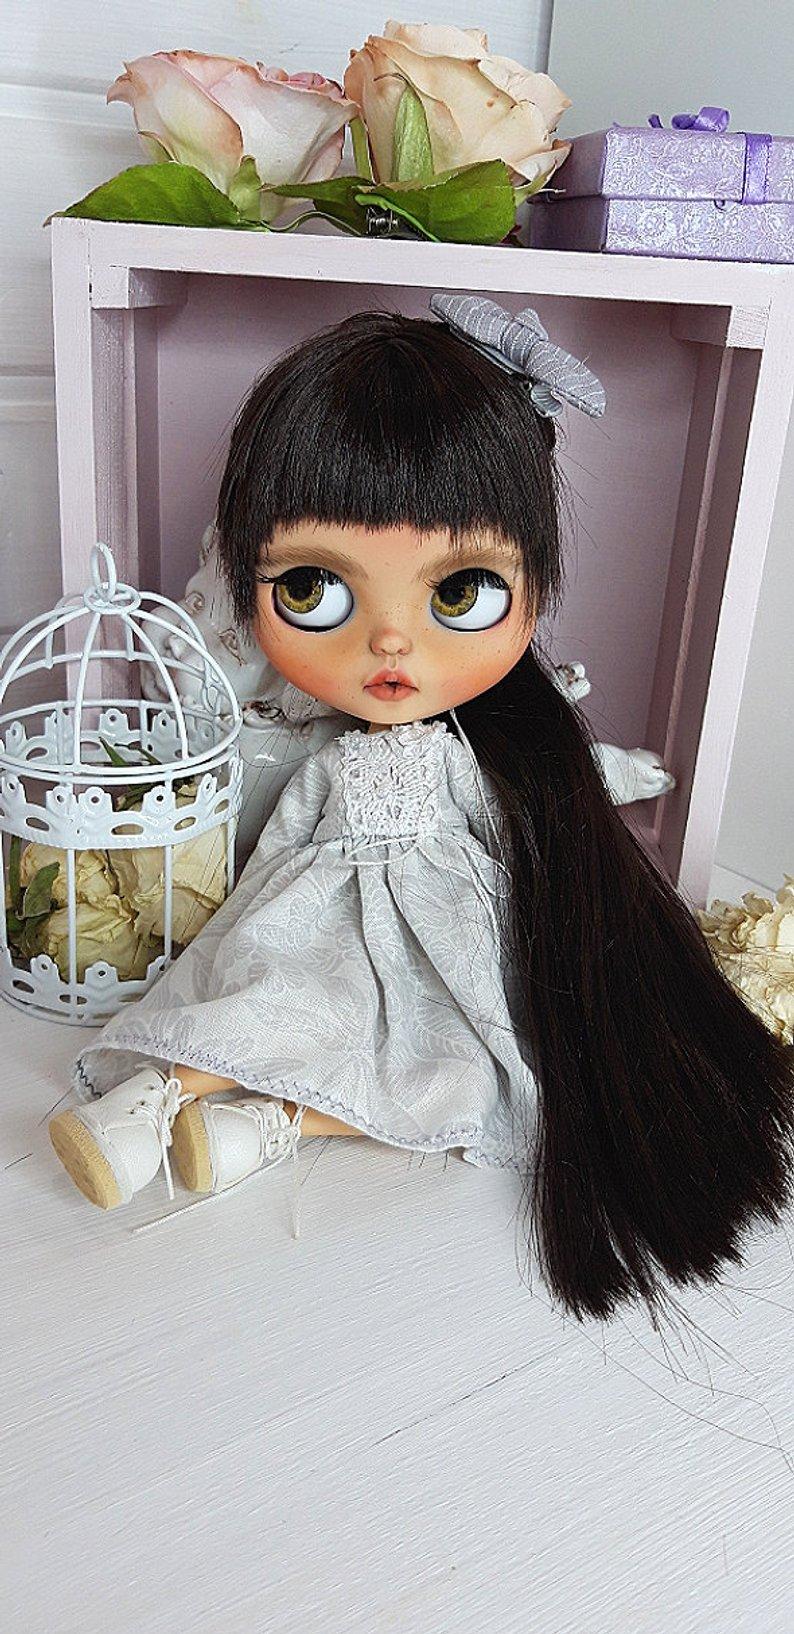 Amanda - Custom Blythe Doll One-Of-A-Kind OOAK Sold-out Custom Blythes